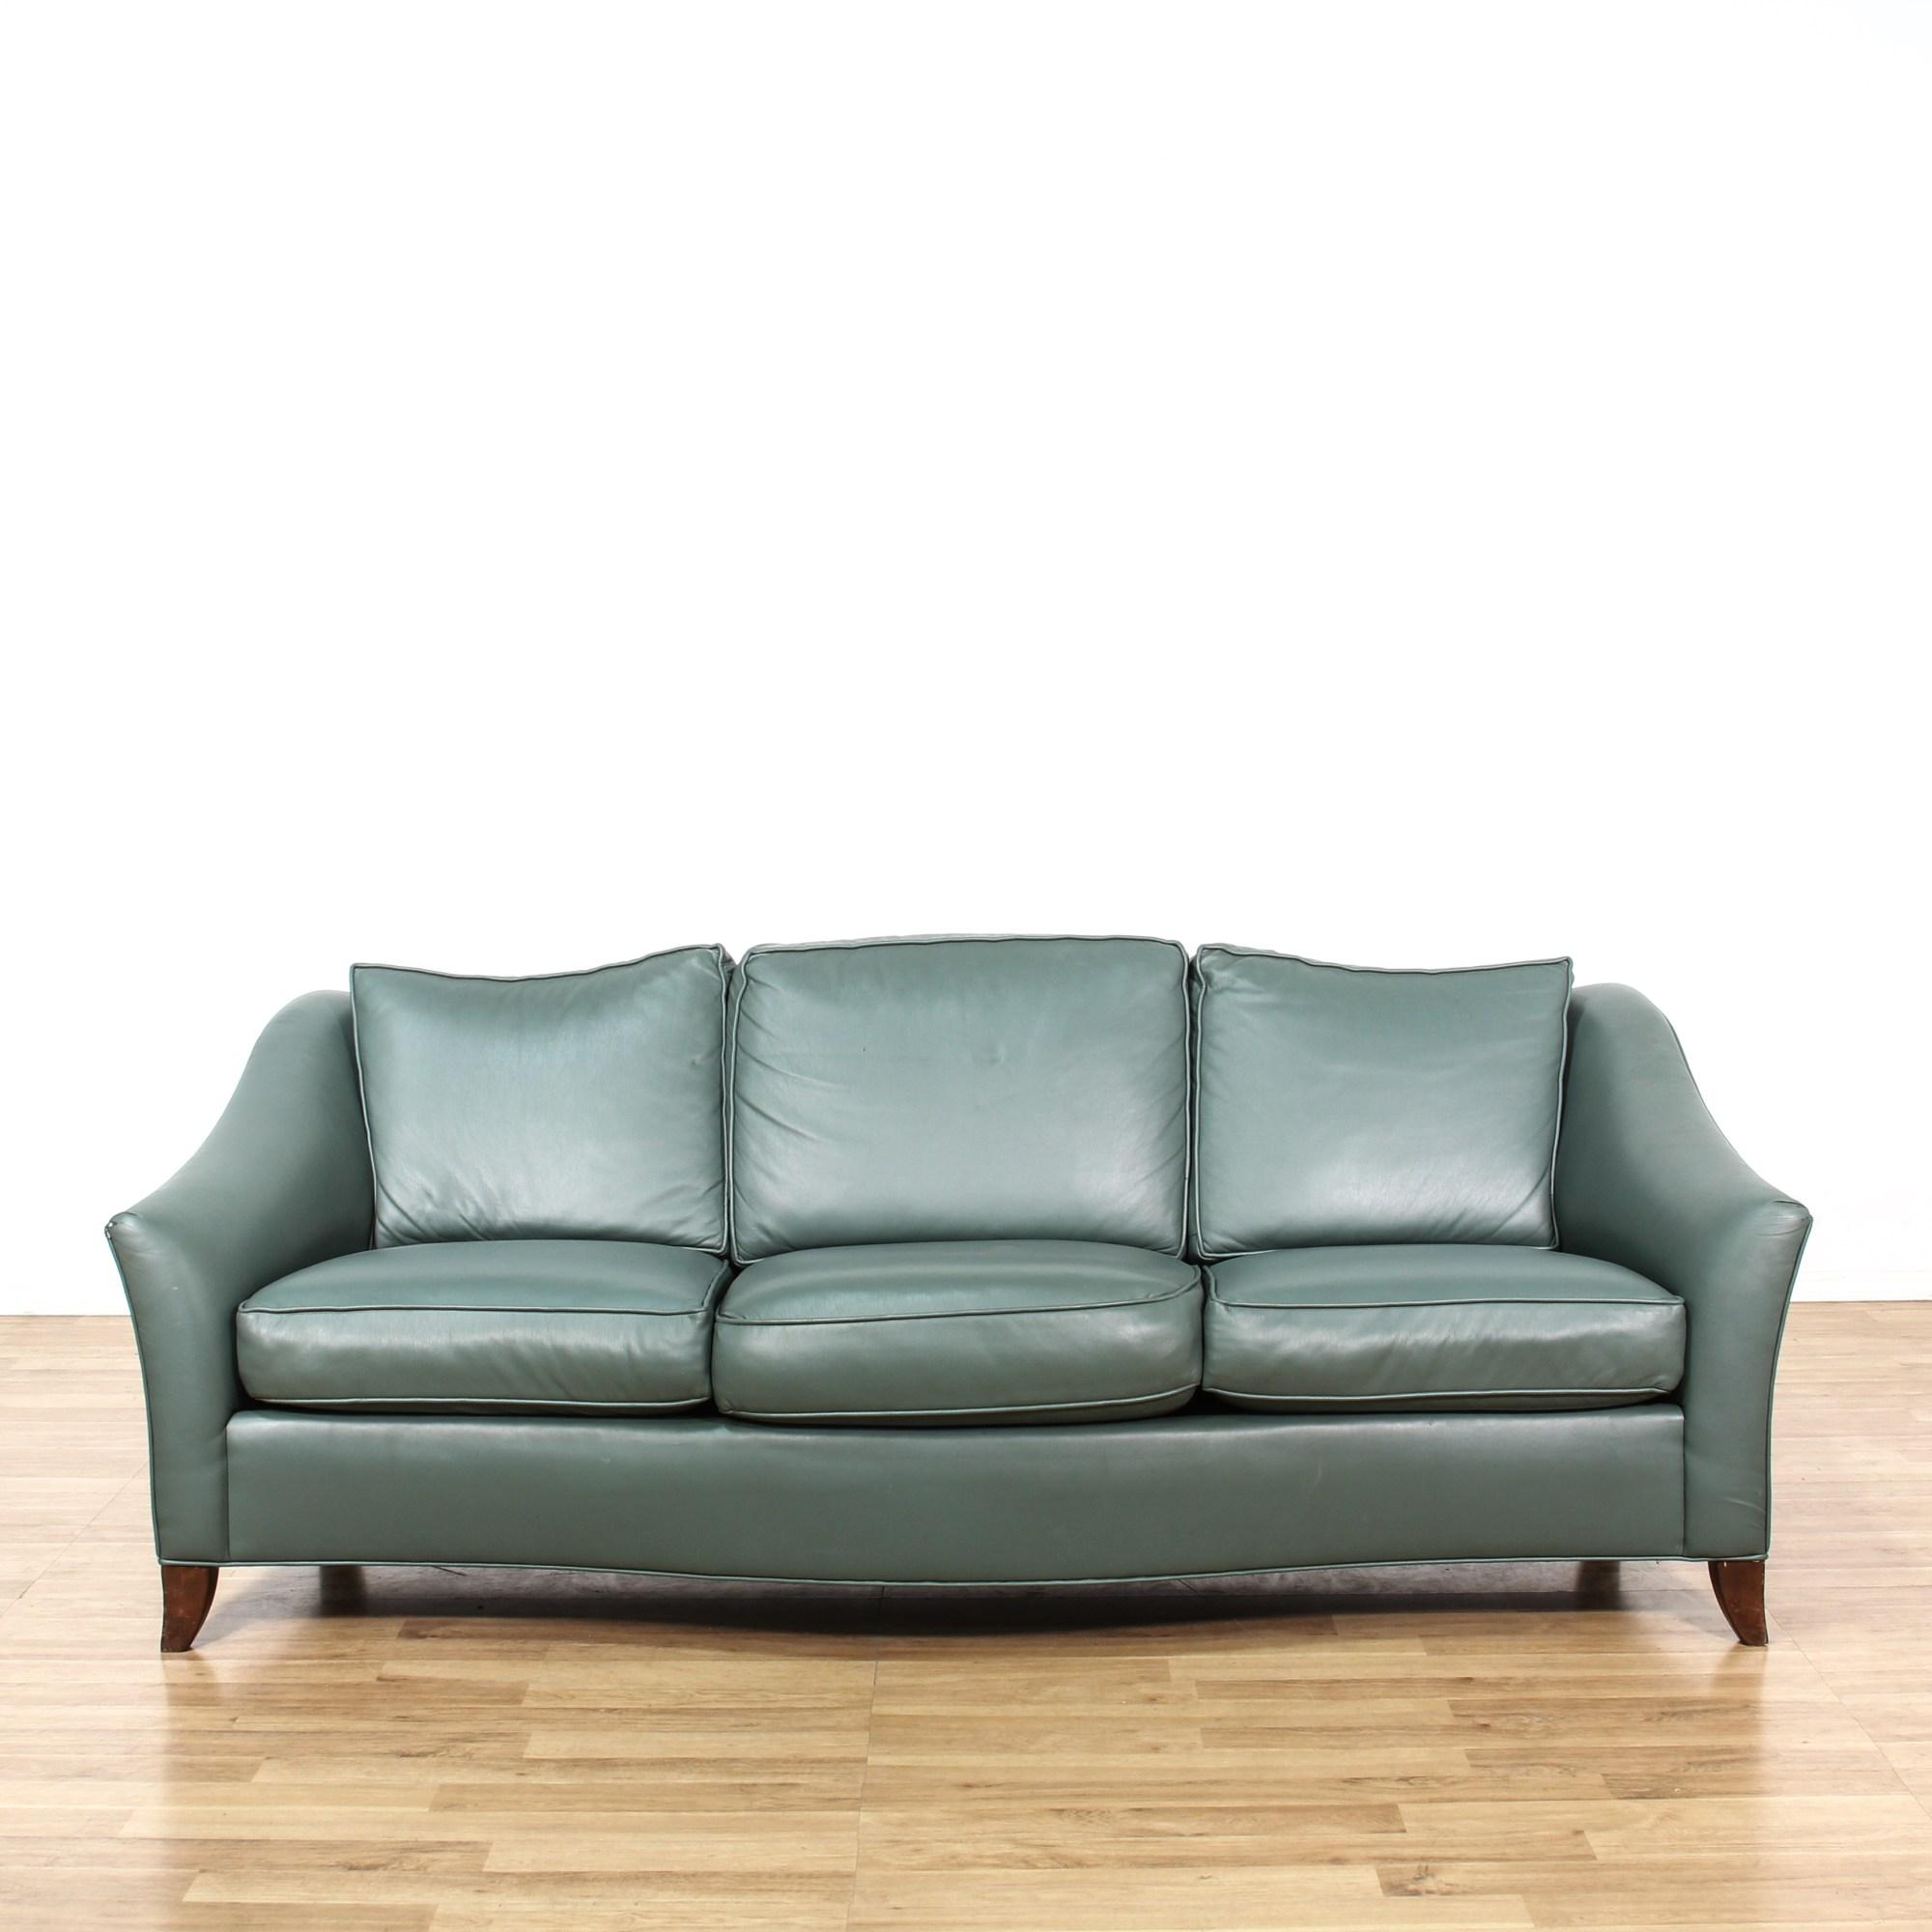 Soft Leather Sofas Furniture